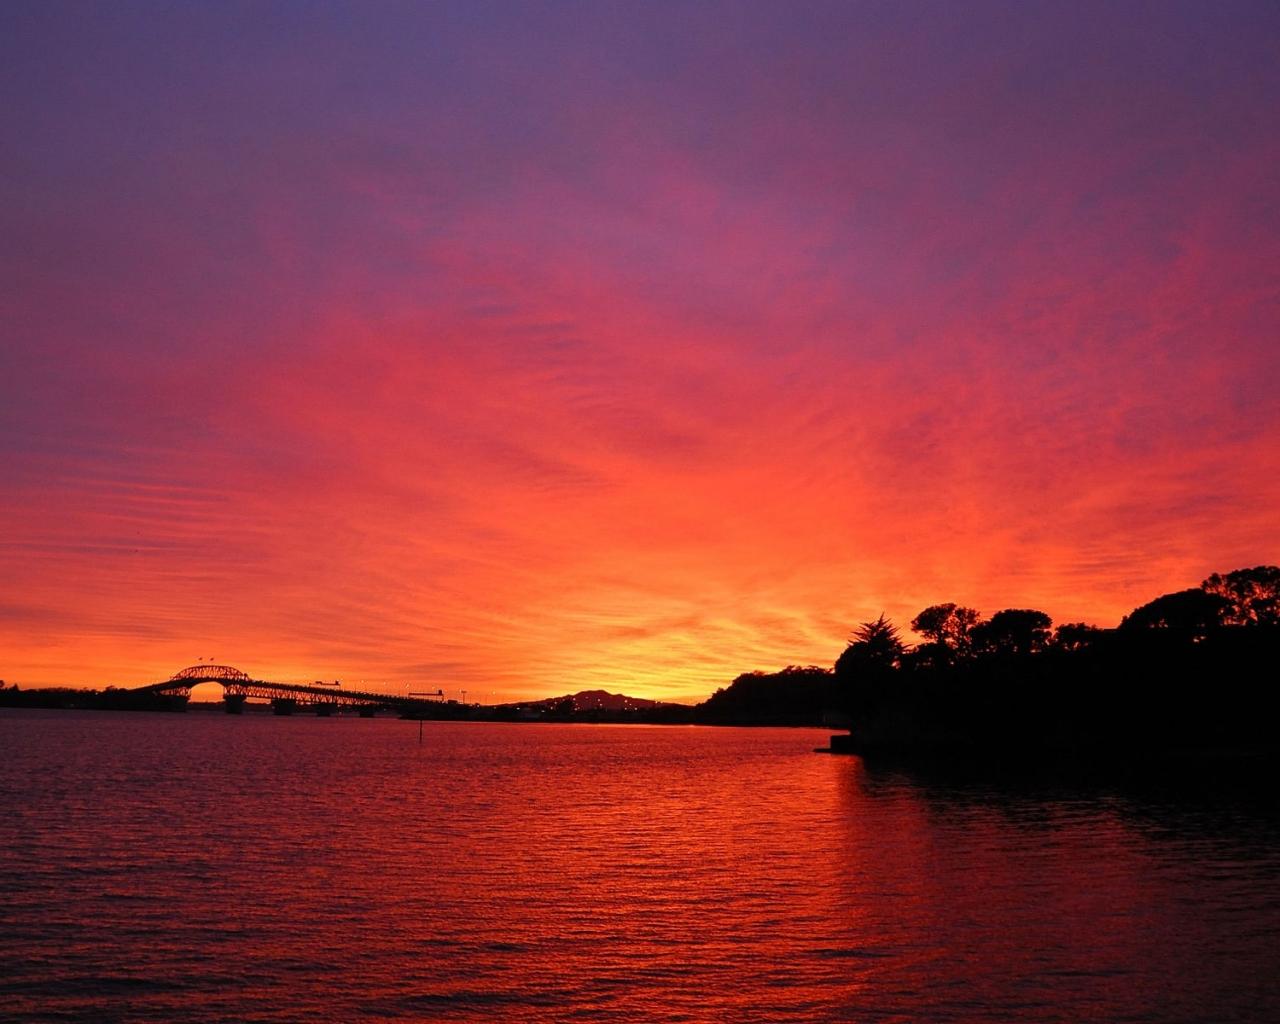 Puesta de sol roja - 1280x1024